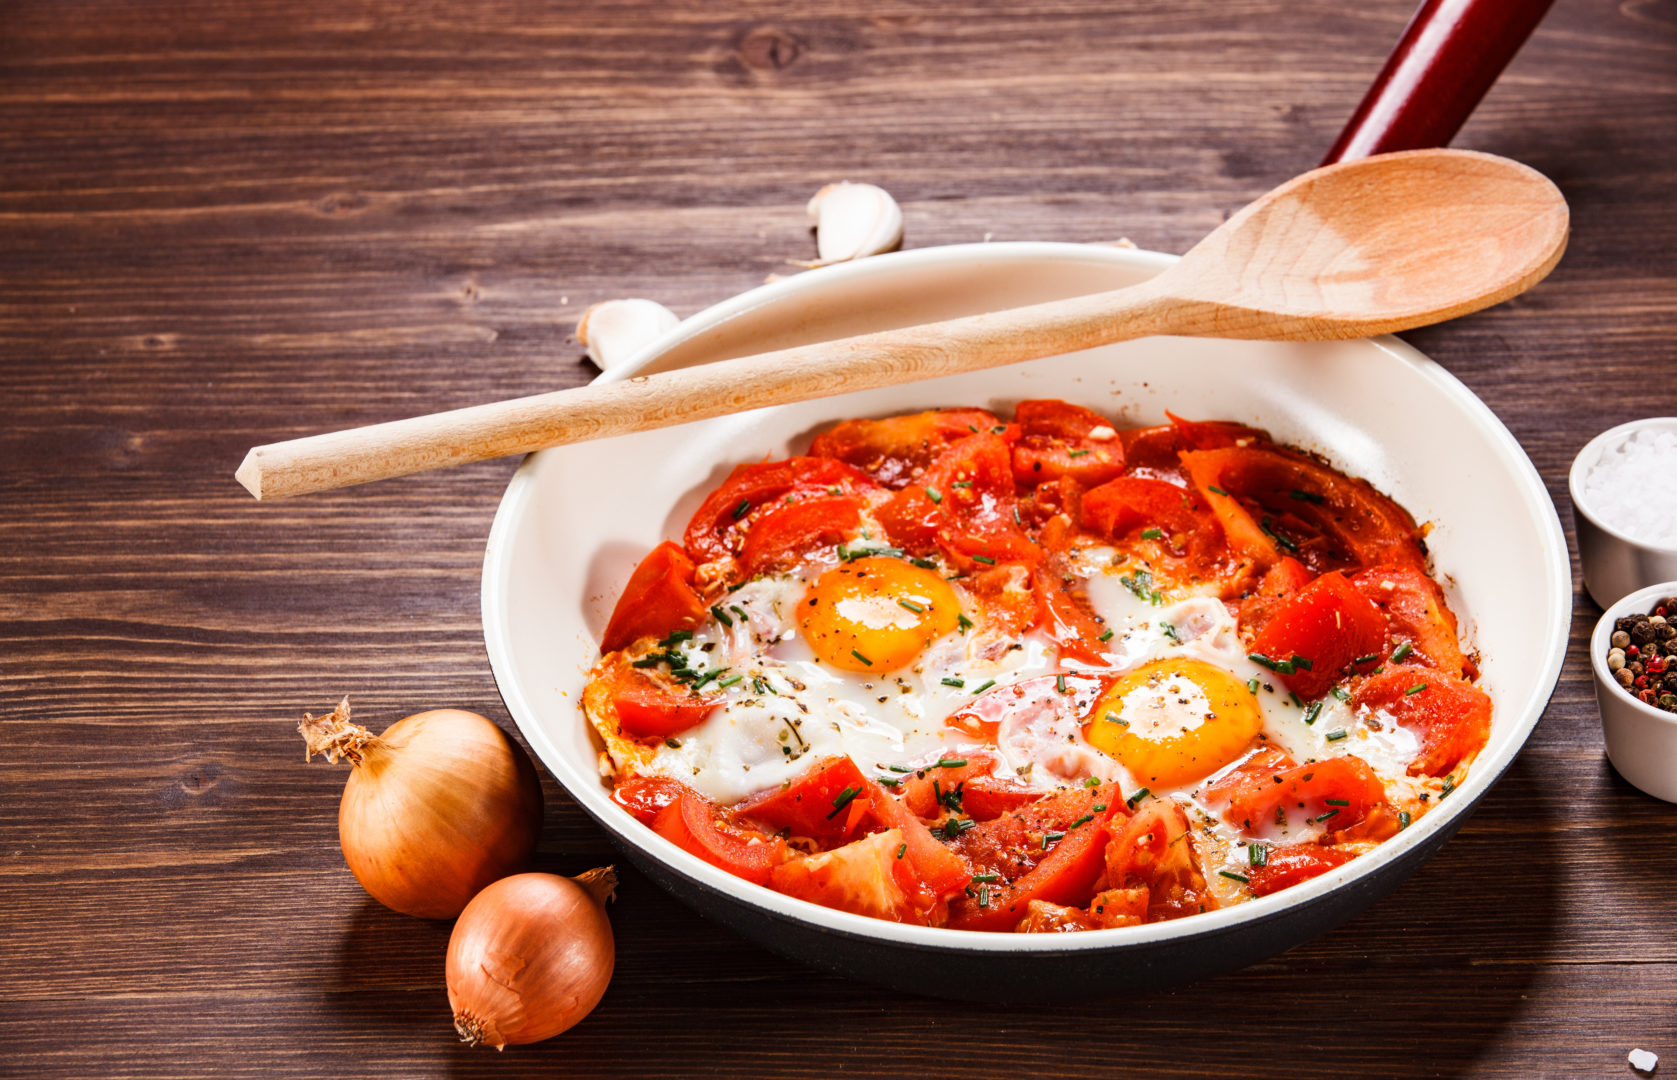 Shakshuka - fried eggs with vegetables in frying pan